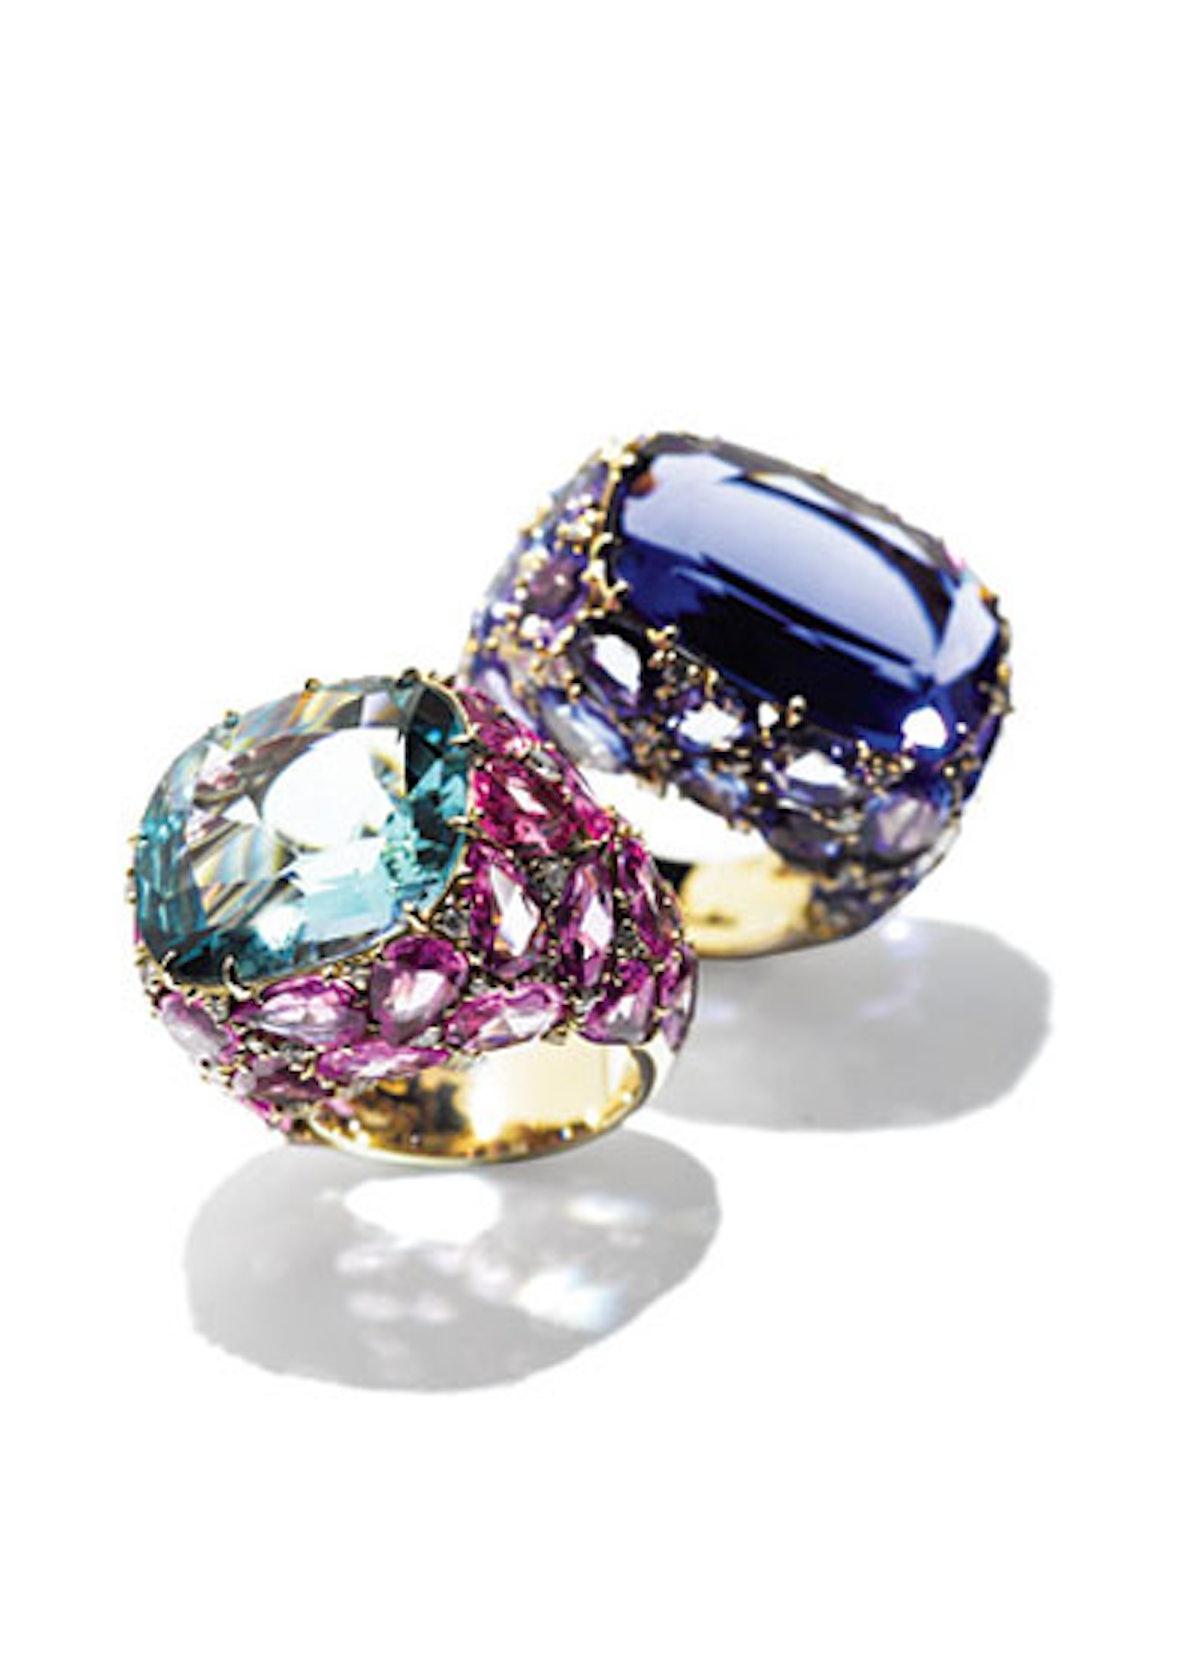 acss-claudias-jewelry-box-may-2012-06-v.jpg